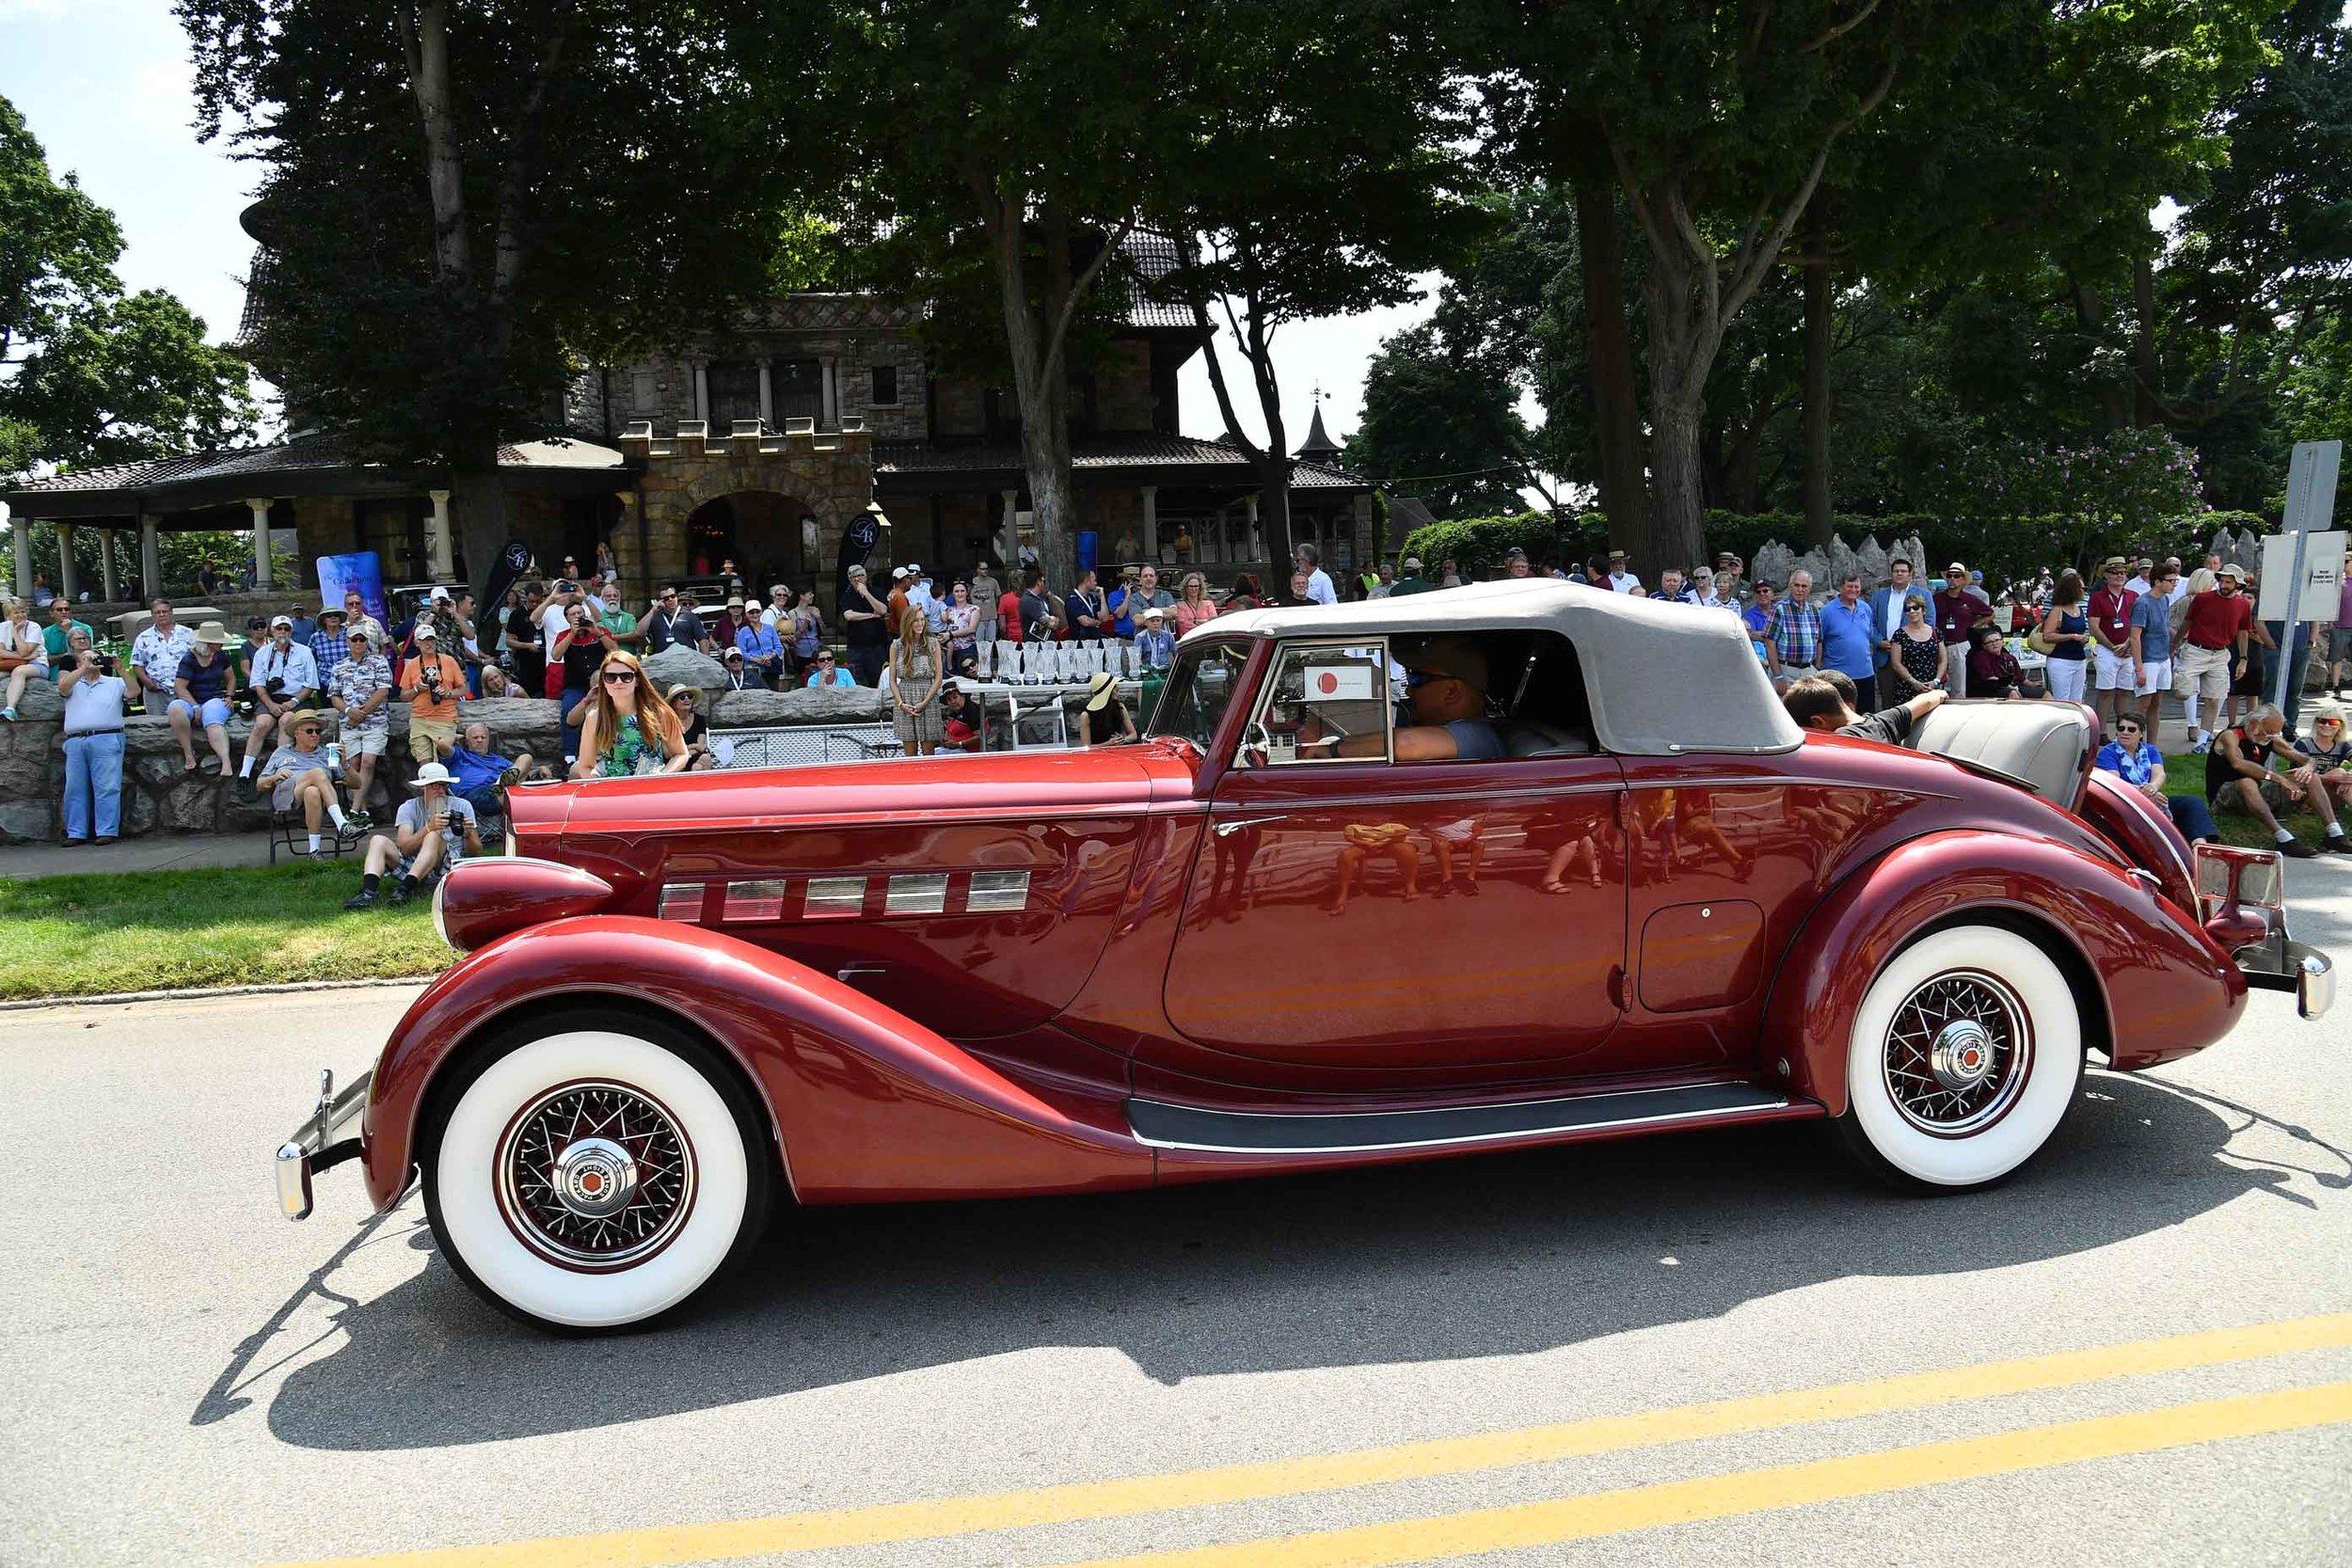 The Packard Motor Car Company